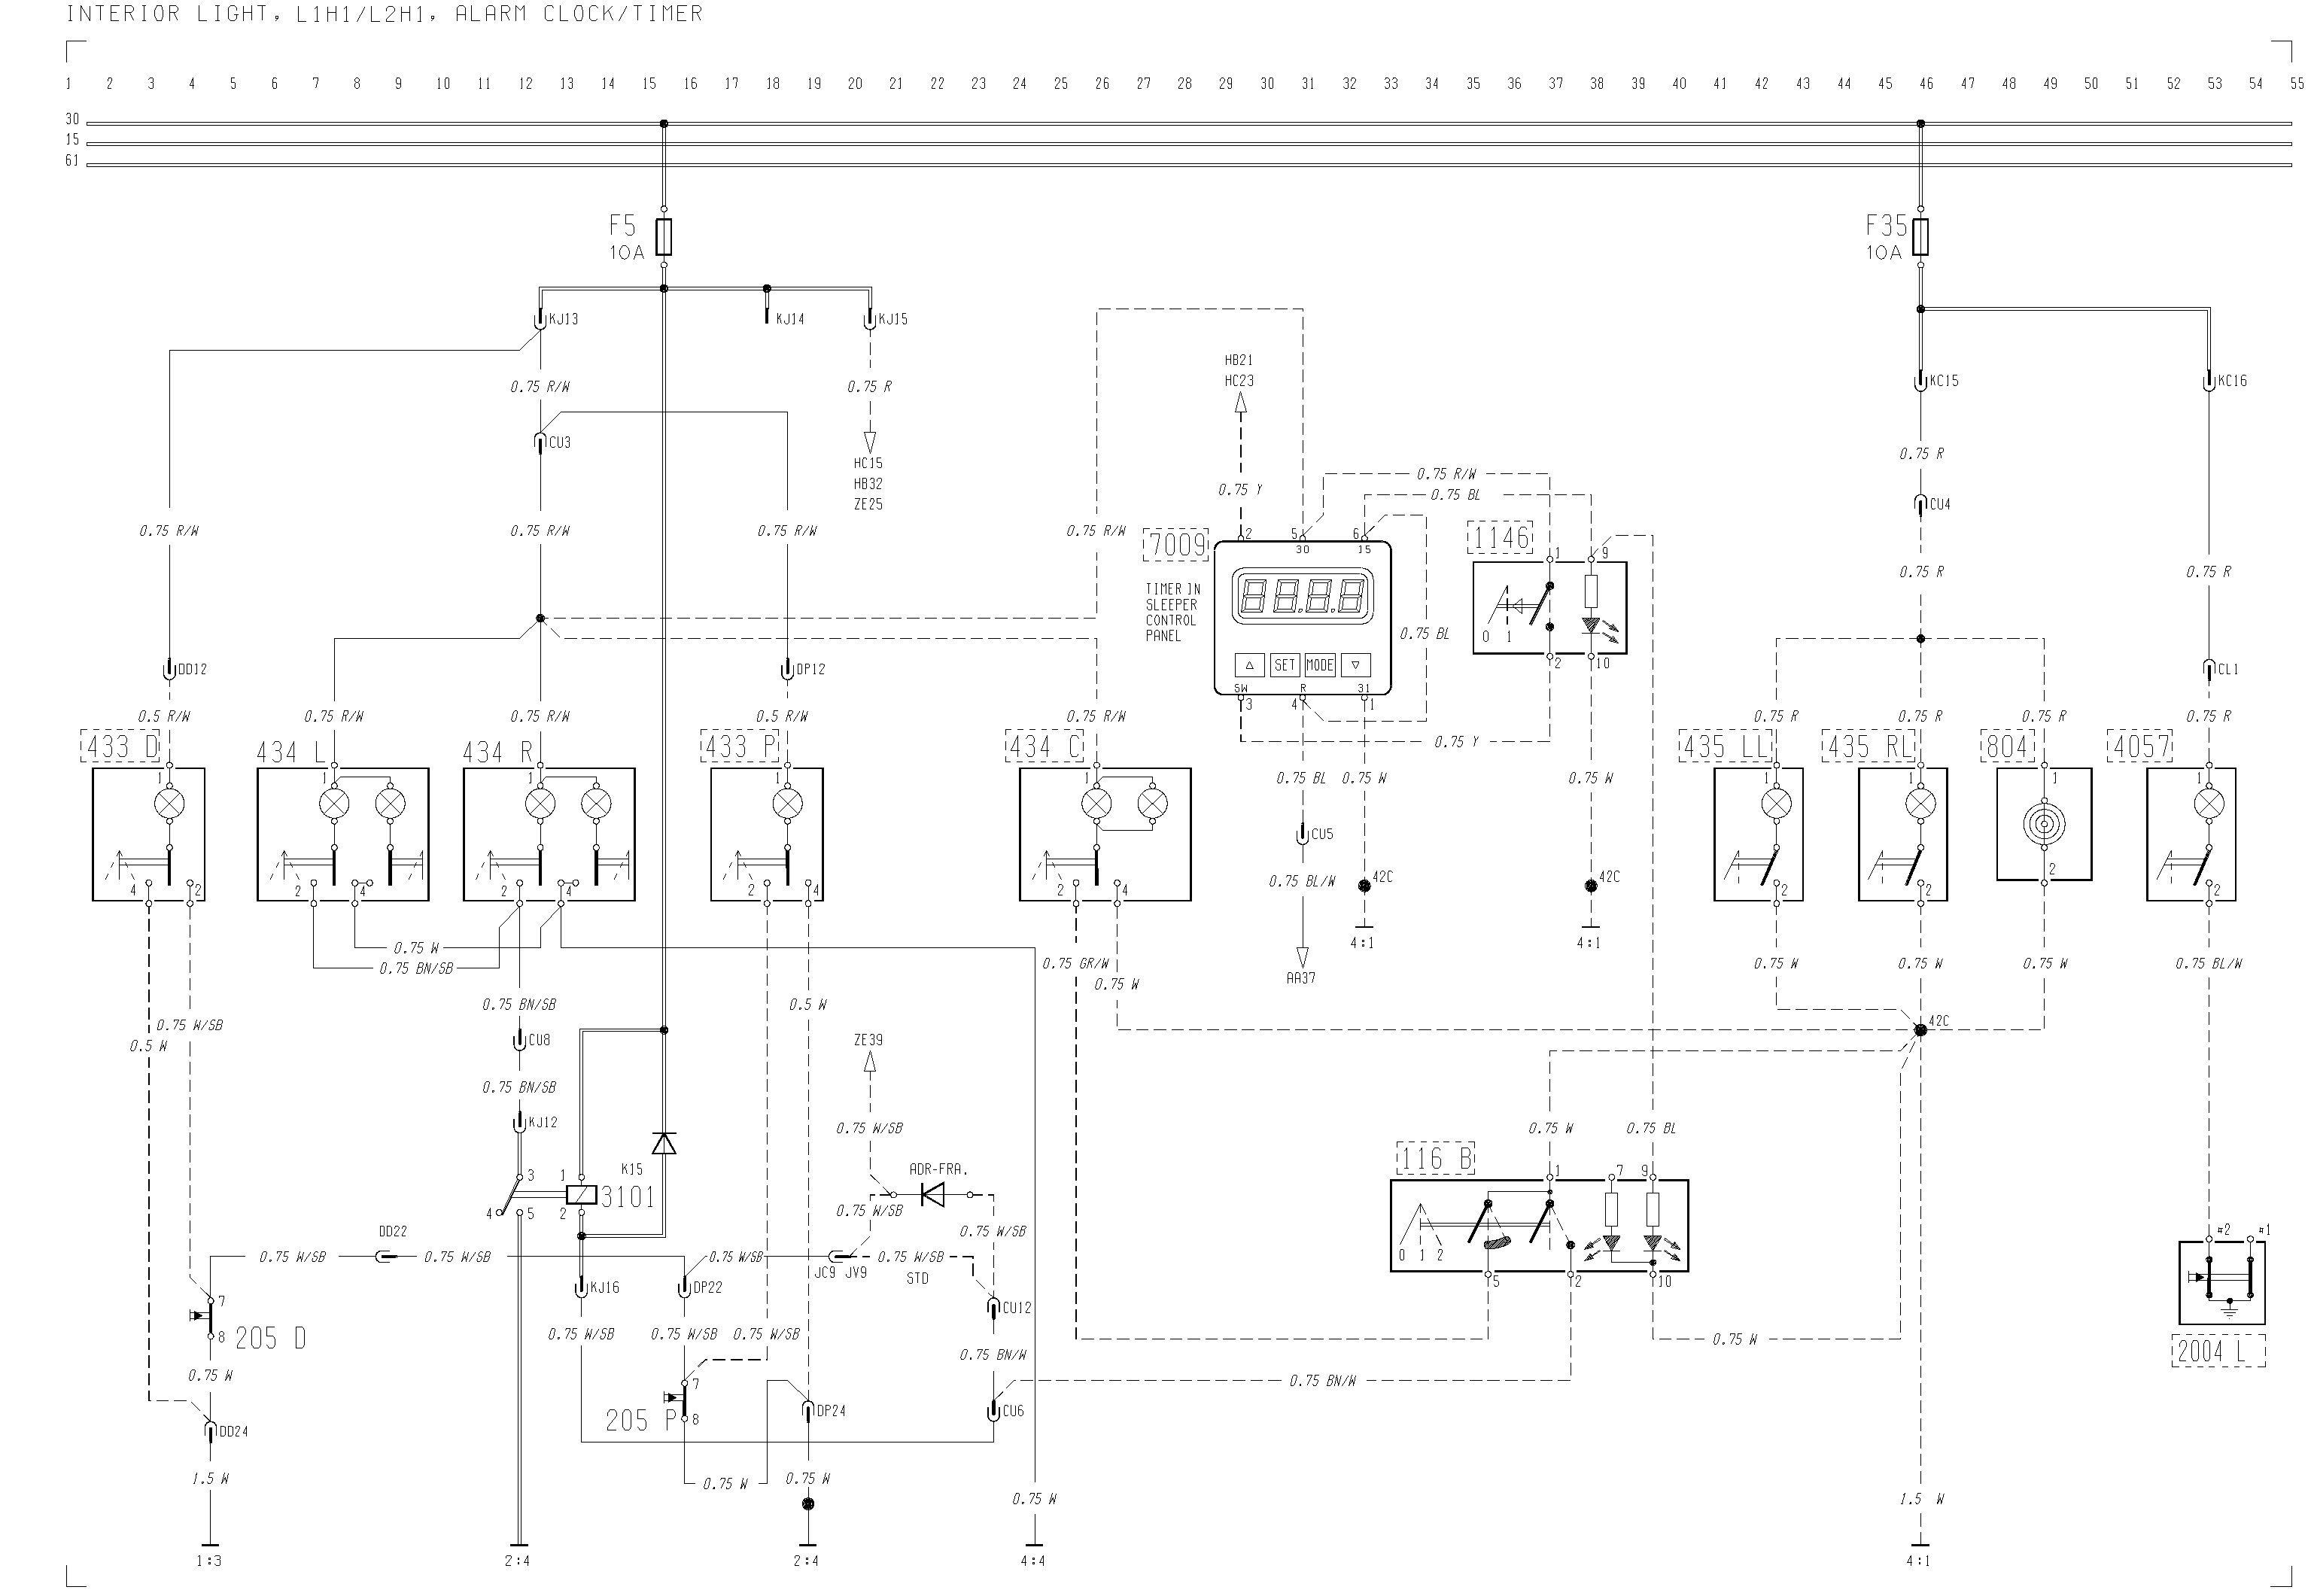 Volvo F12, F16 - wiring diagram -interior light, L1H1/L2H1 ... on